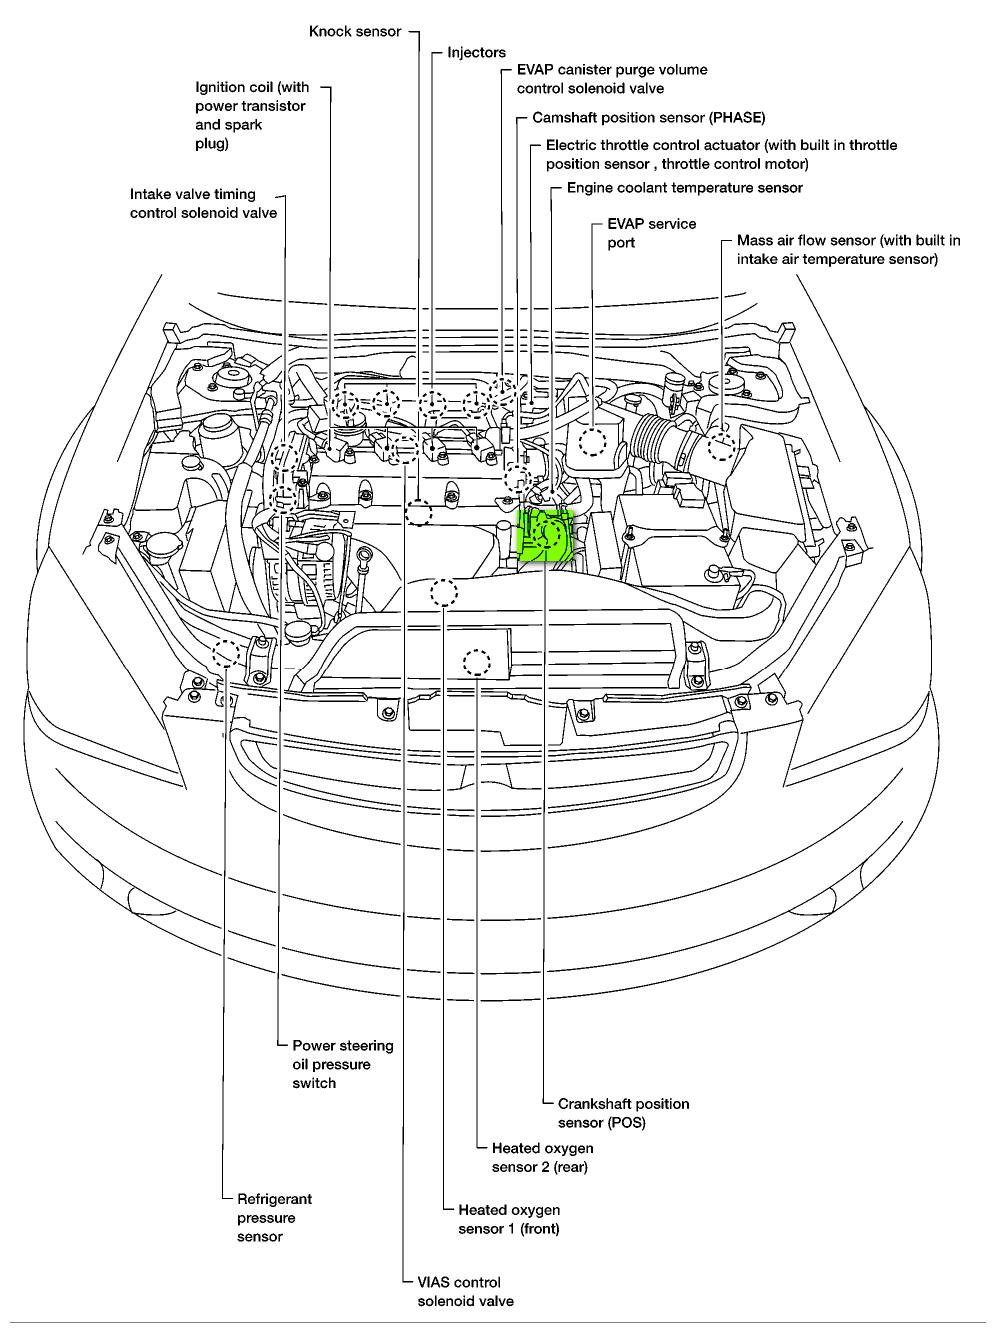 Where Is The Crankshaft Position Sensor On A 2002 Nissan Altima 4 Cylinder  The Sensor Received